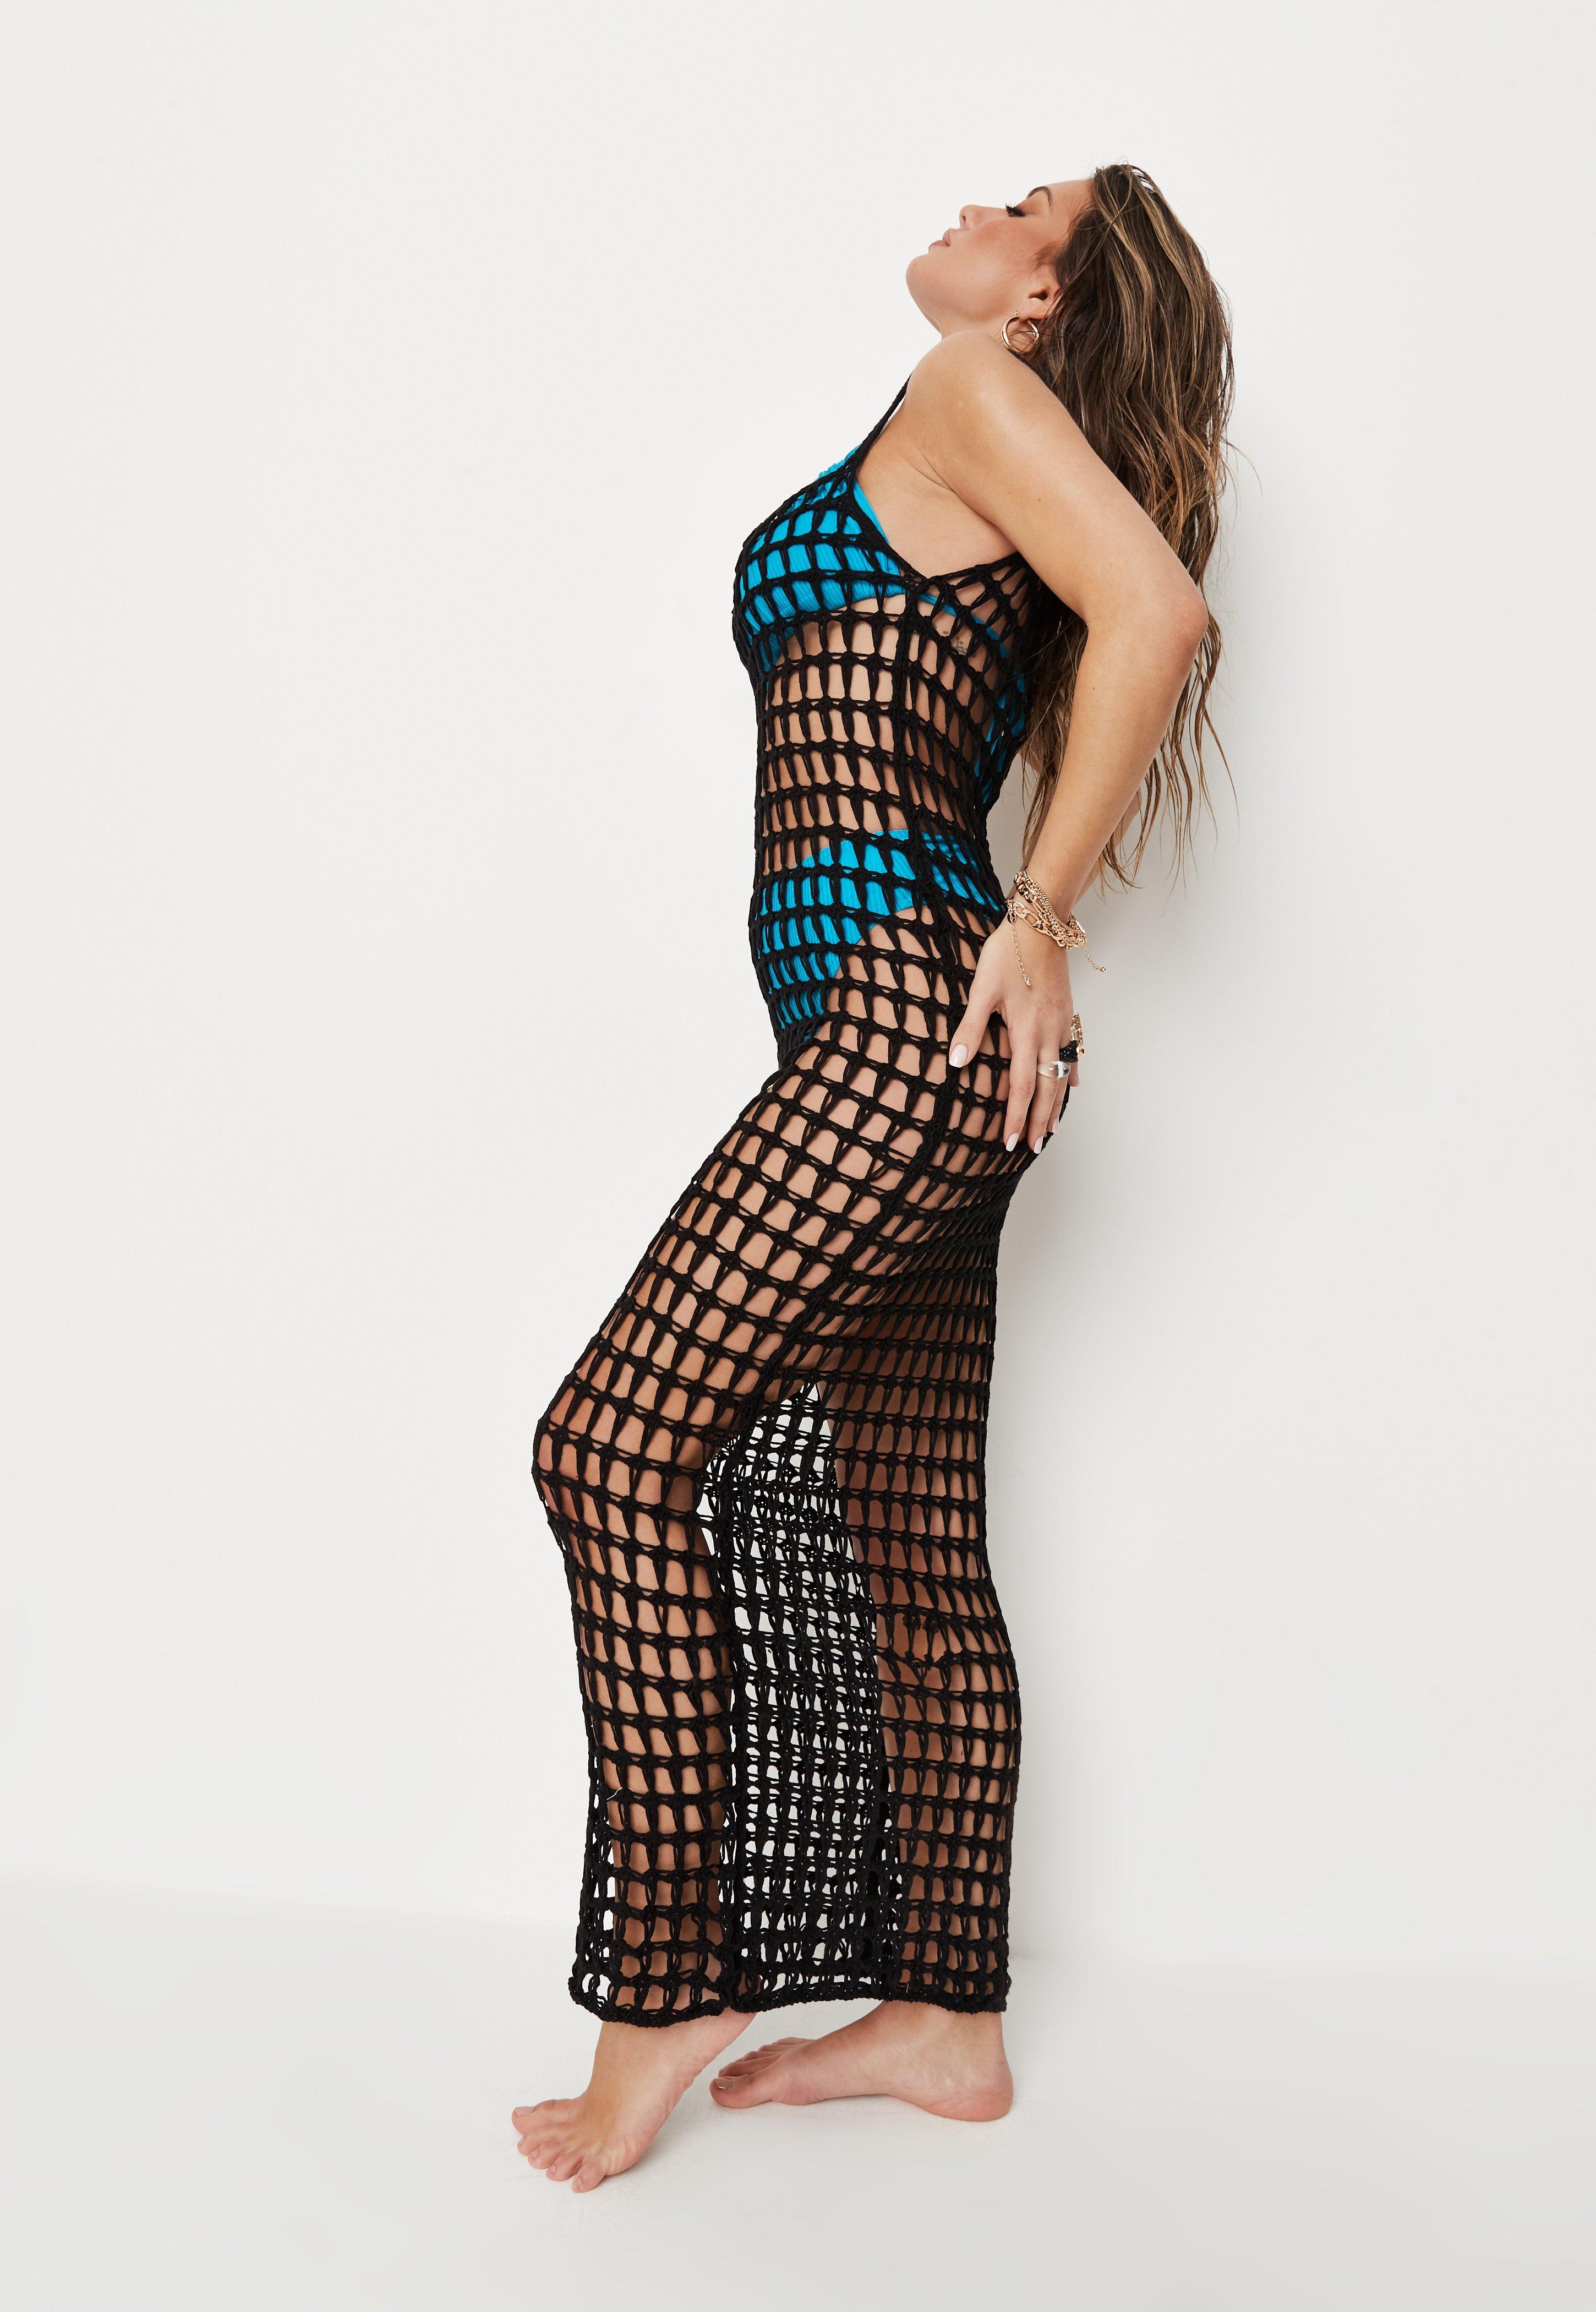 baa775ecc85 Jumper Dresses